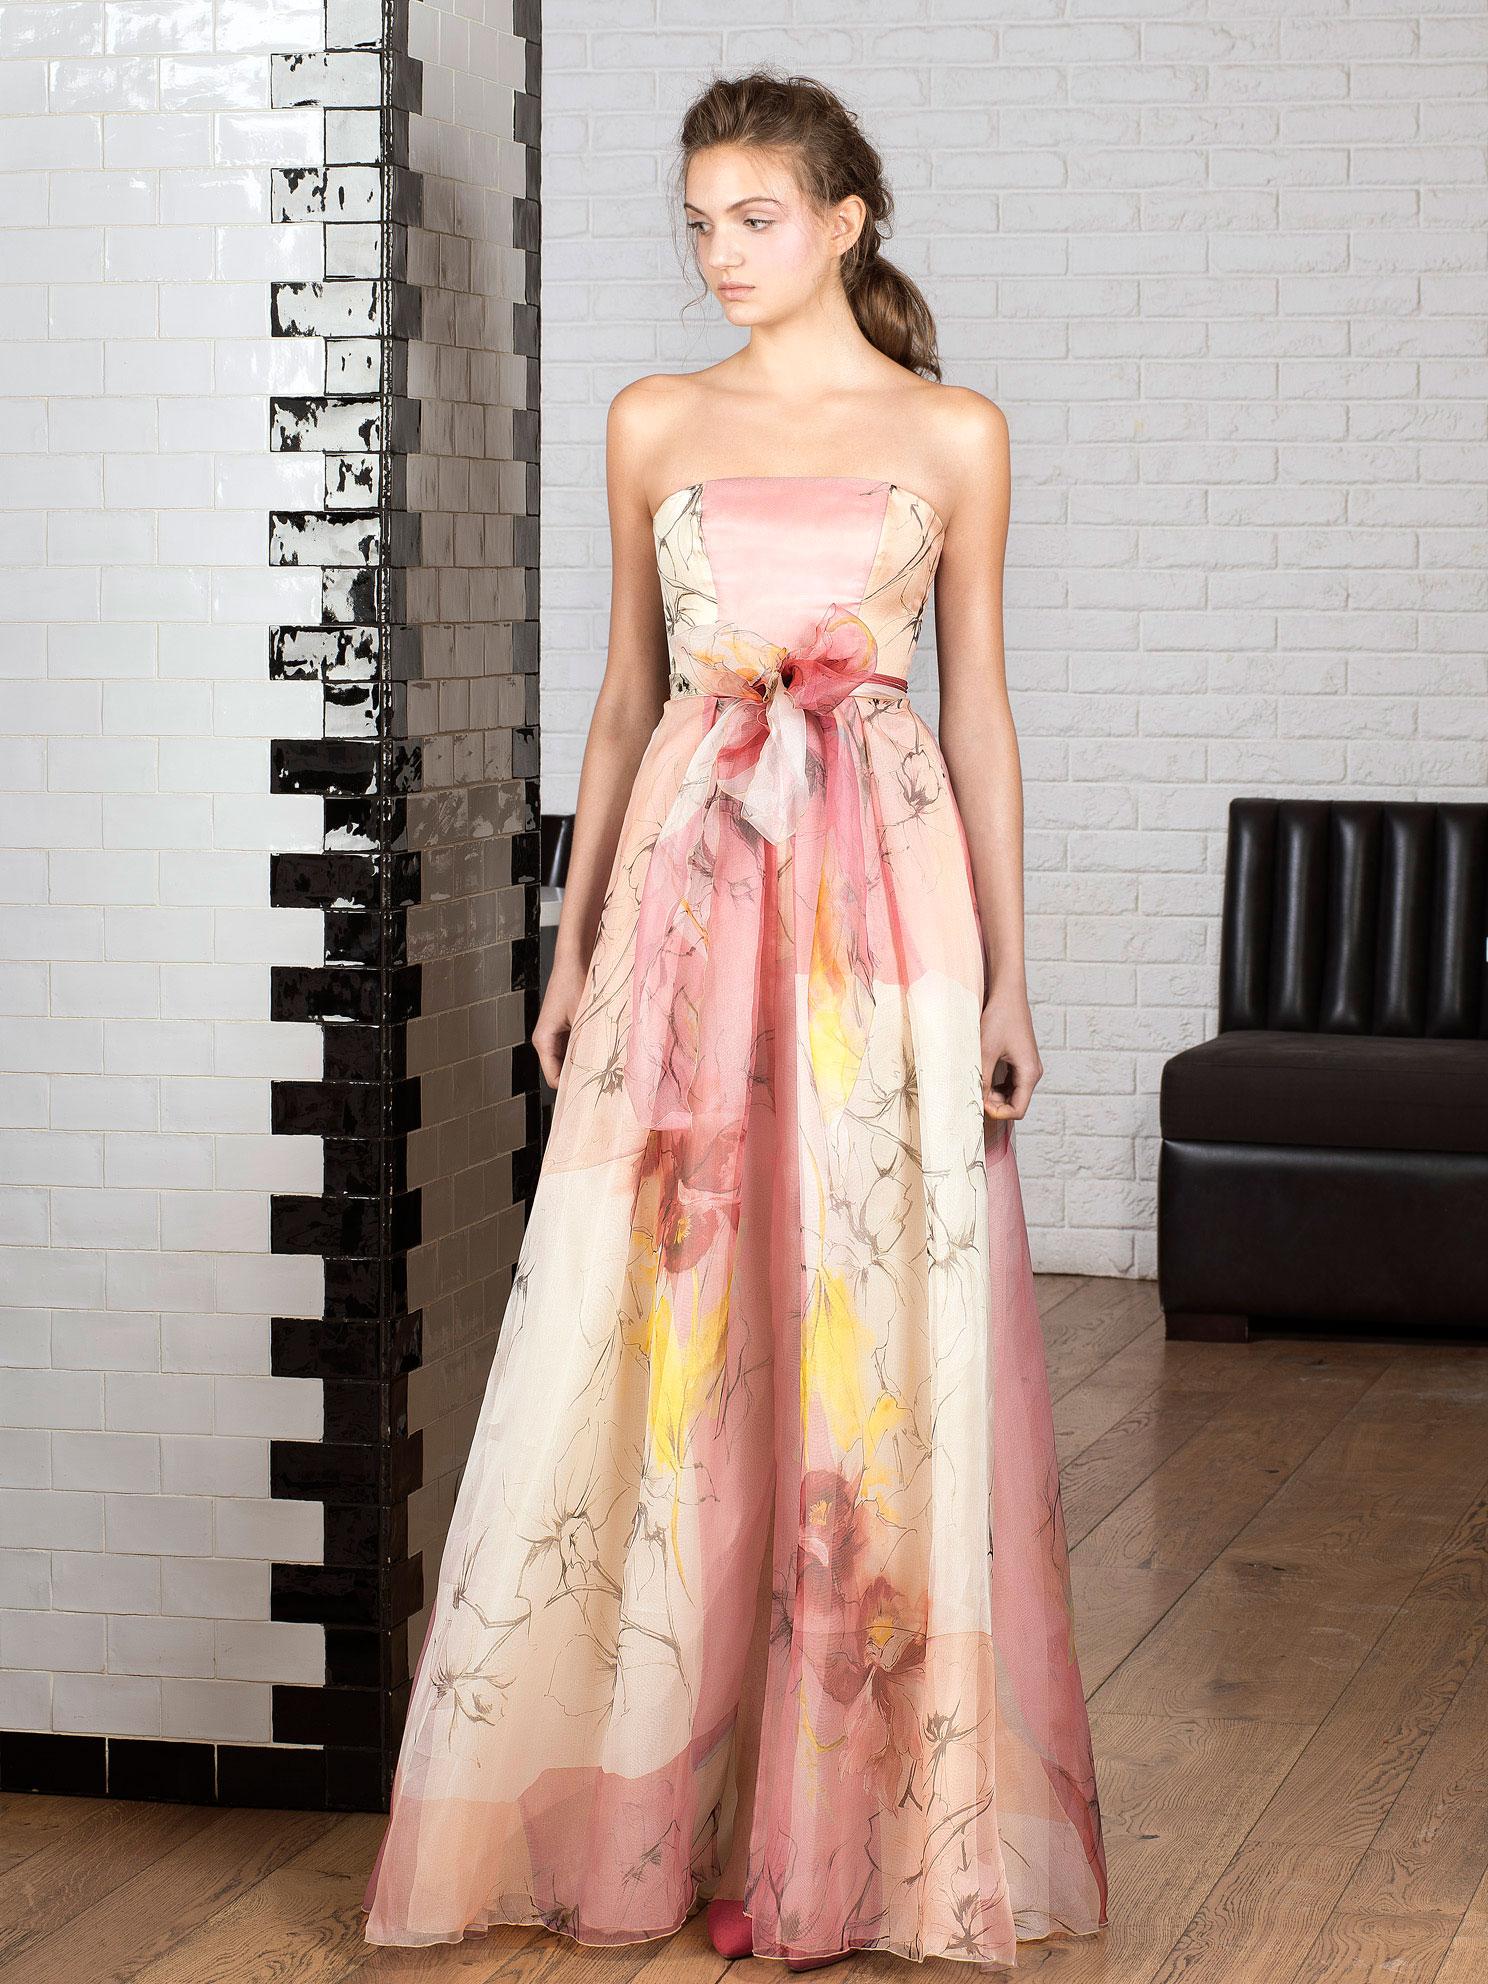 inmaculada-garcia-barcelona-vestidos-fiesta-tadea-01